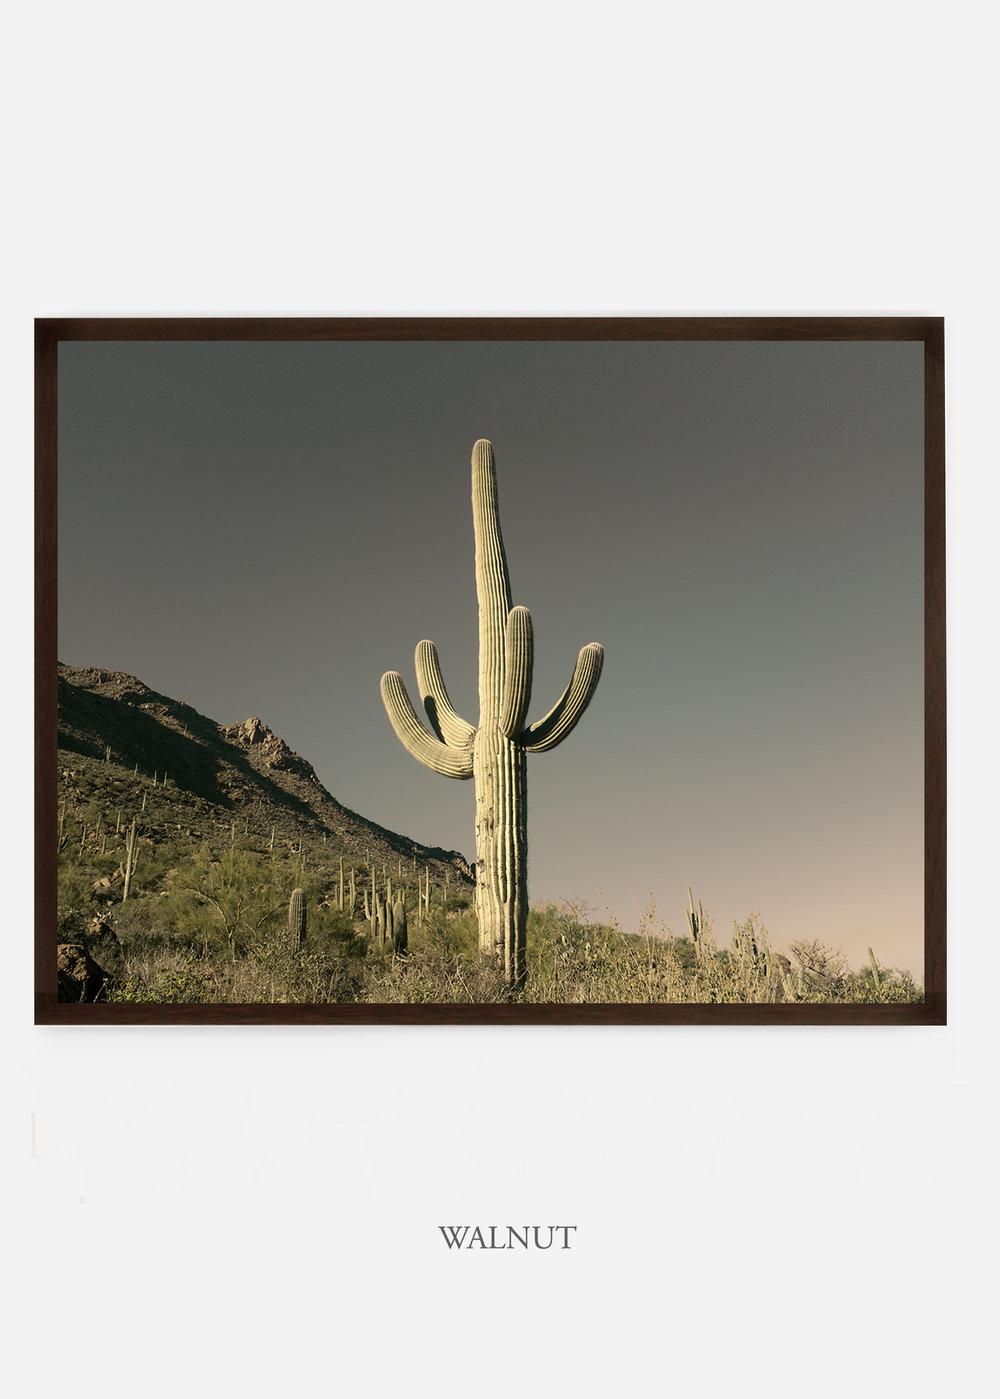 nomat_walnutframe-saguaroNo.19-wildercalifornia-art-wallart-cactusprint-homedecor-prints-arizona-botanical-artwork-interiordesign.jpg